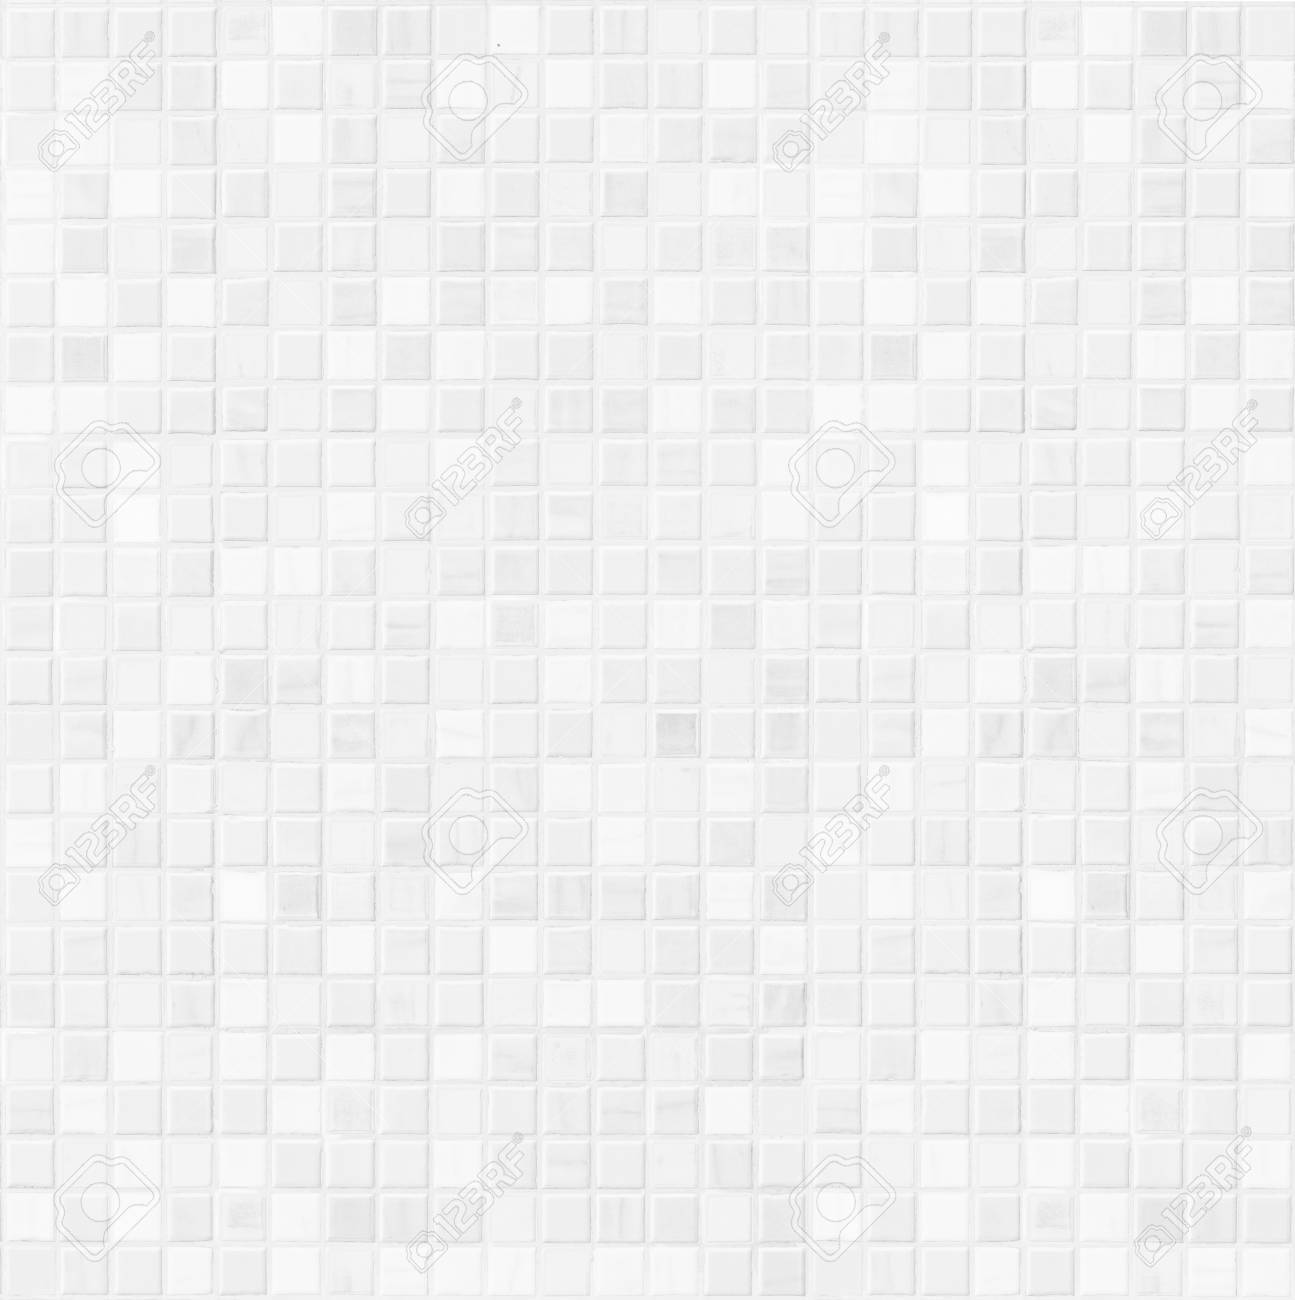 White ceramic bathroom wall tile pattern for background - 71650408